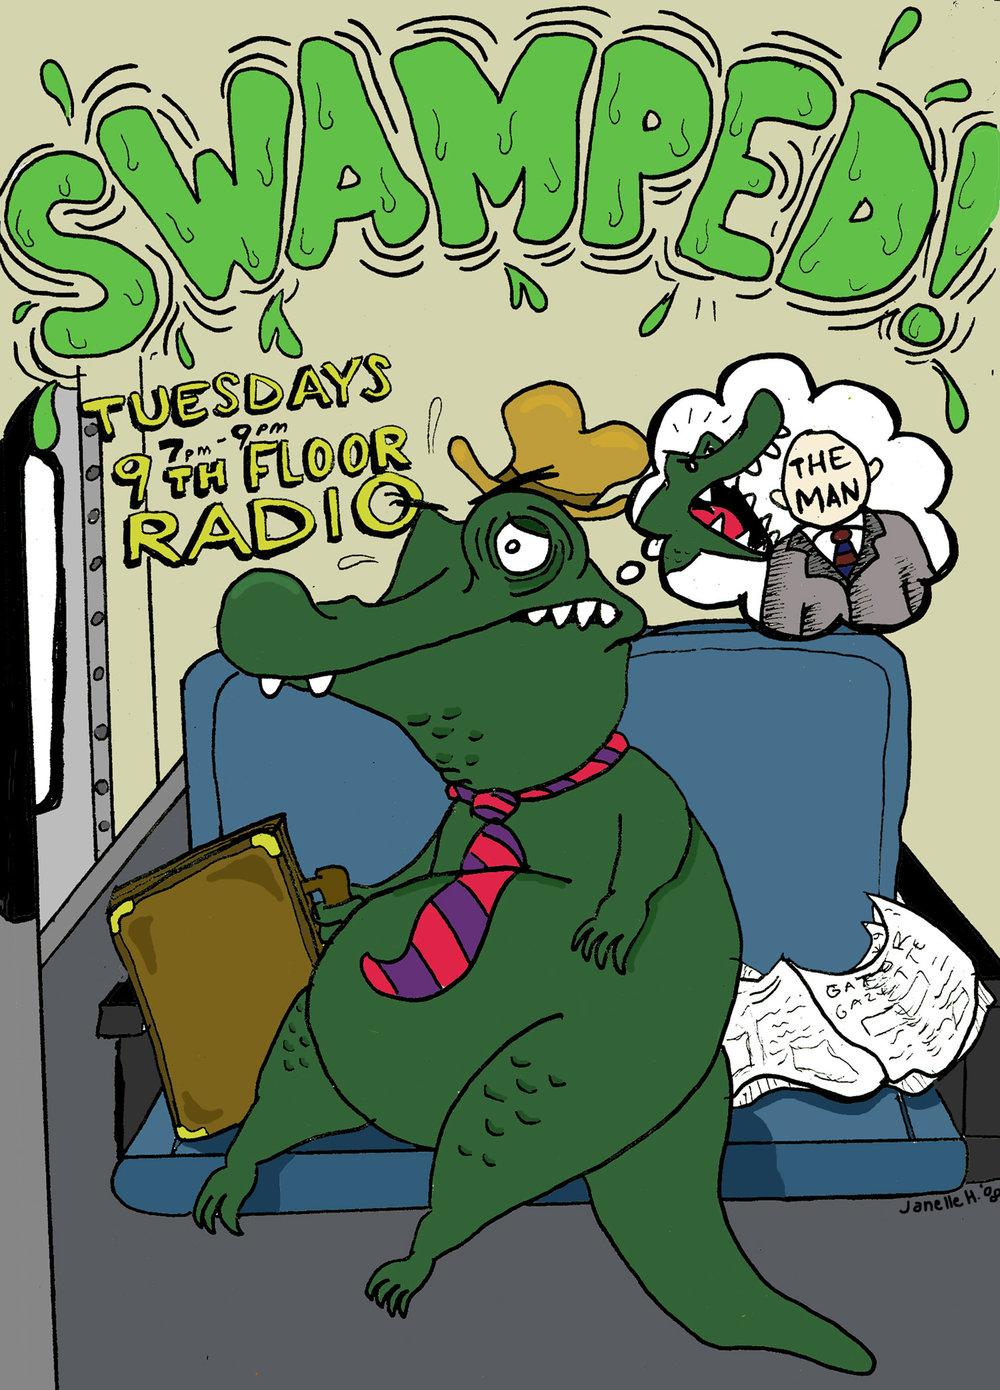 Swamped, Radio Show